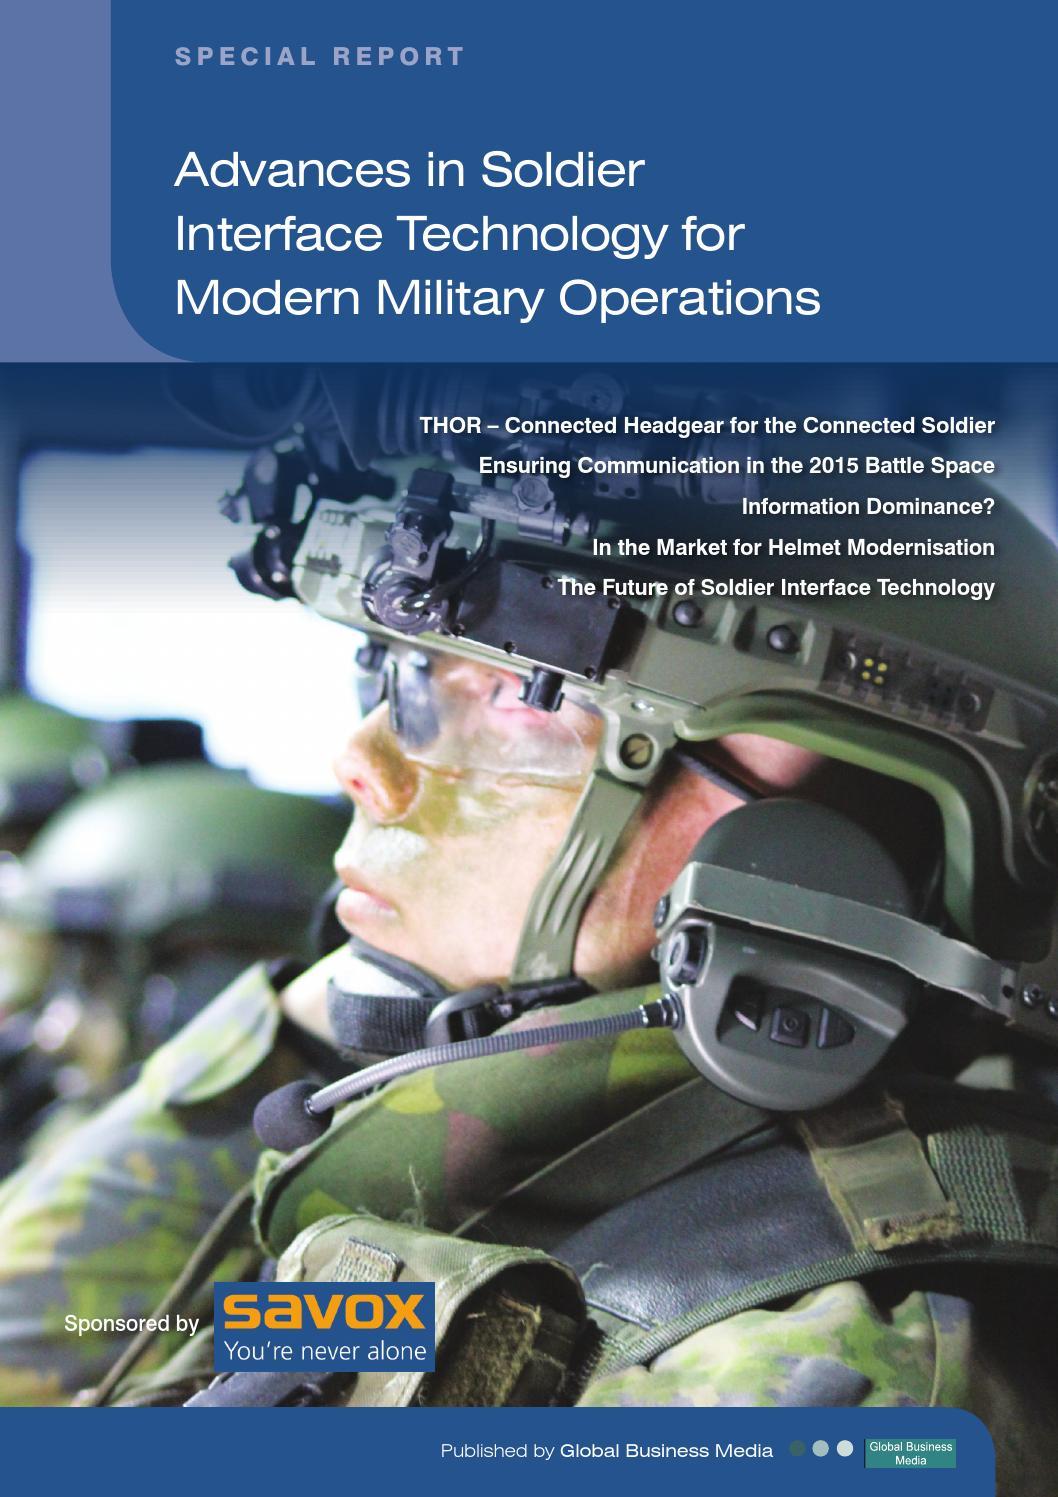 7 Technologies That Transformed Warfare